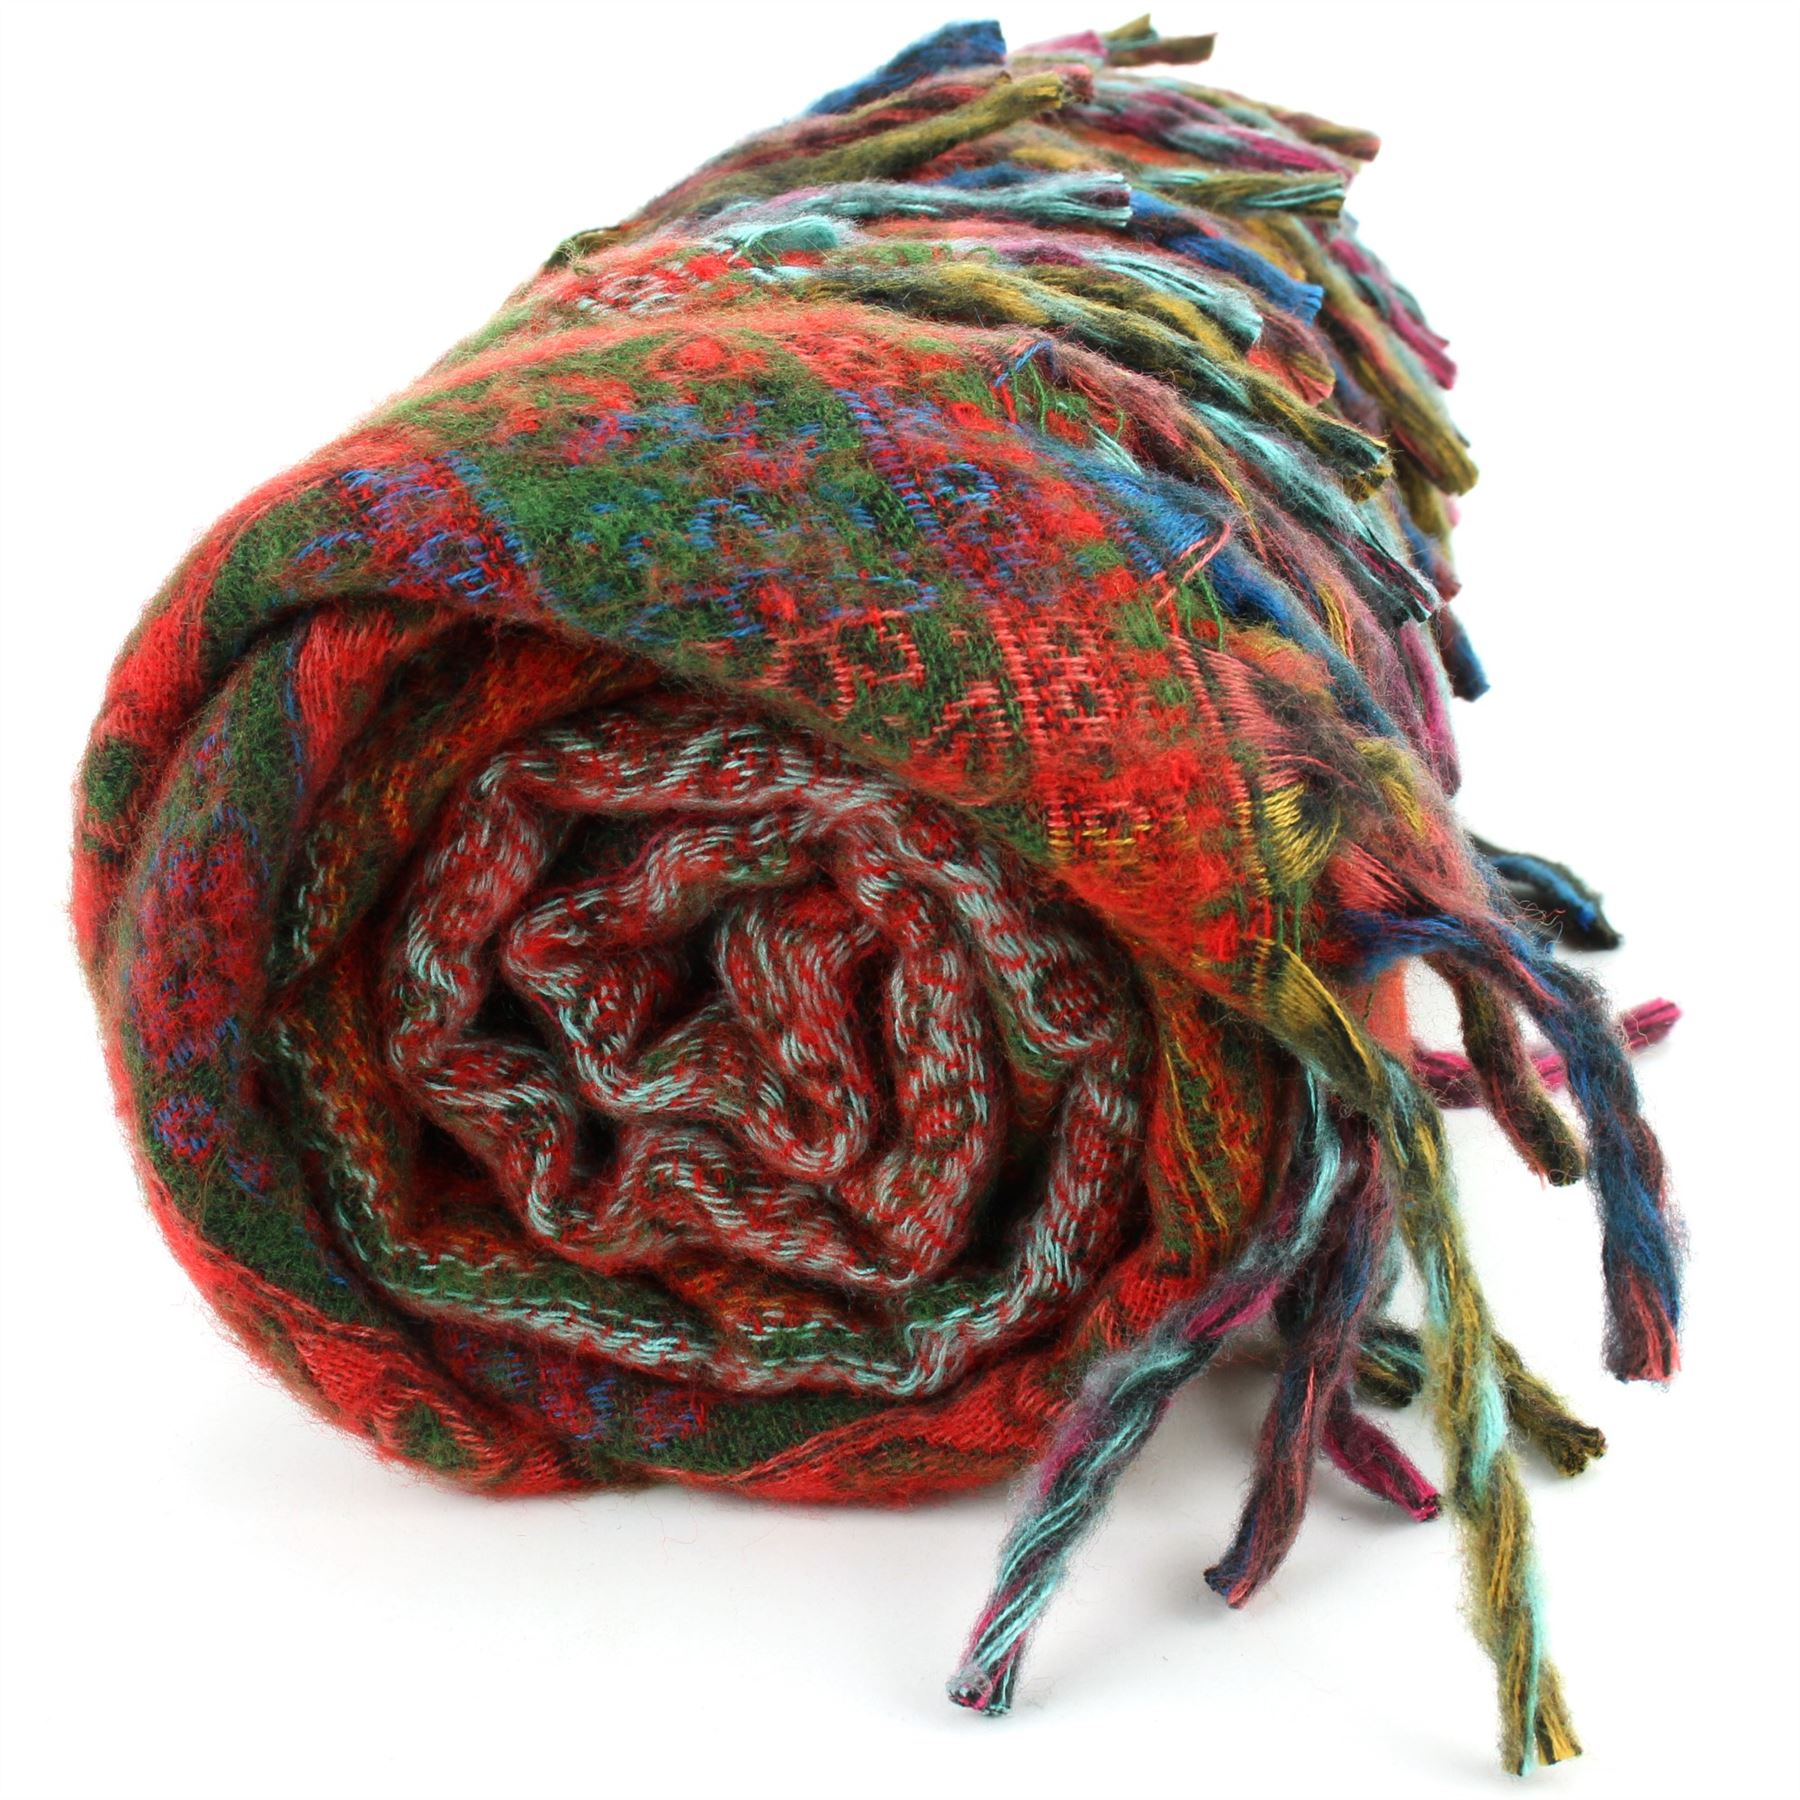 Acrylic-Wool-Blanket-Shawl-Wrap-Throw-Finest-Softest-India-Stripe-Paisley-Travel thumbnail 40